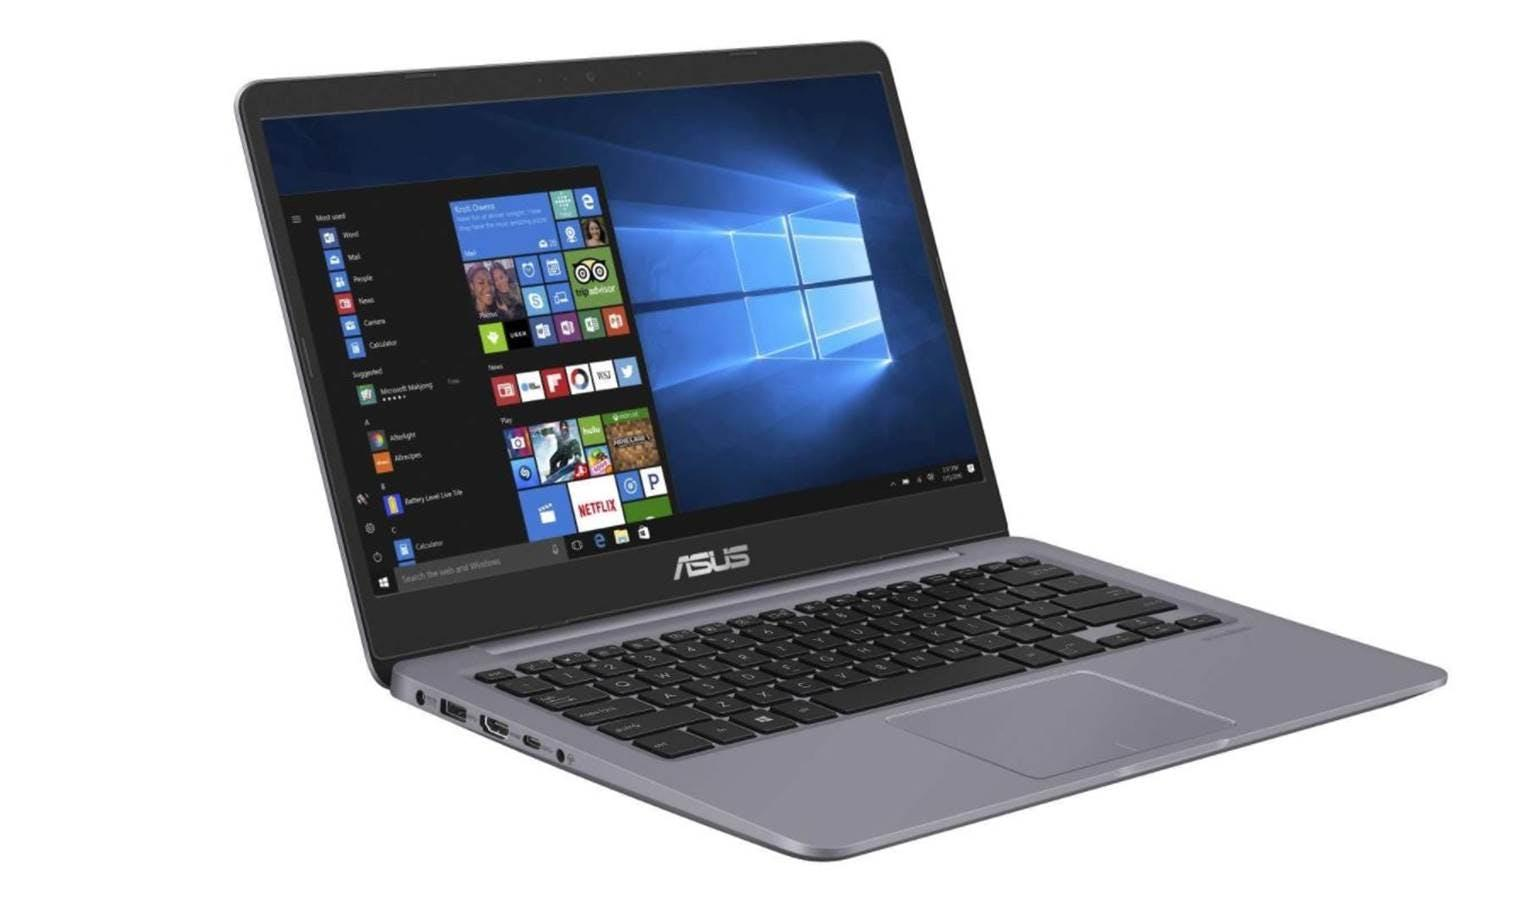 "ASUS X411UF-BV070T i5-8250U Processor 1.6GHz (6M Cache, Up to 3.4GHz) Windows 10 Home (64-bit) NVIDIA® GeForce® GT MX130 with 2GB DDR5 14.0"" LED-backlit Ultra Slim HD 1,366 x 768 Display 8GB DDR4 RAM & 1TB SATA HDD"